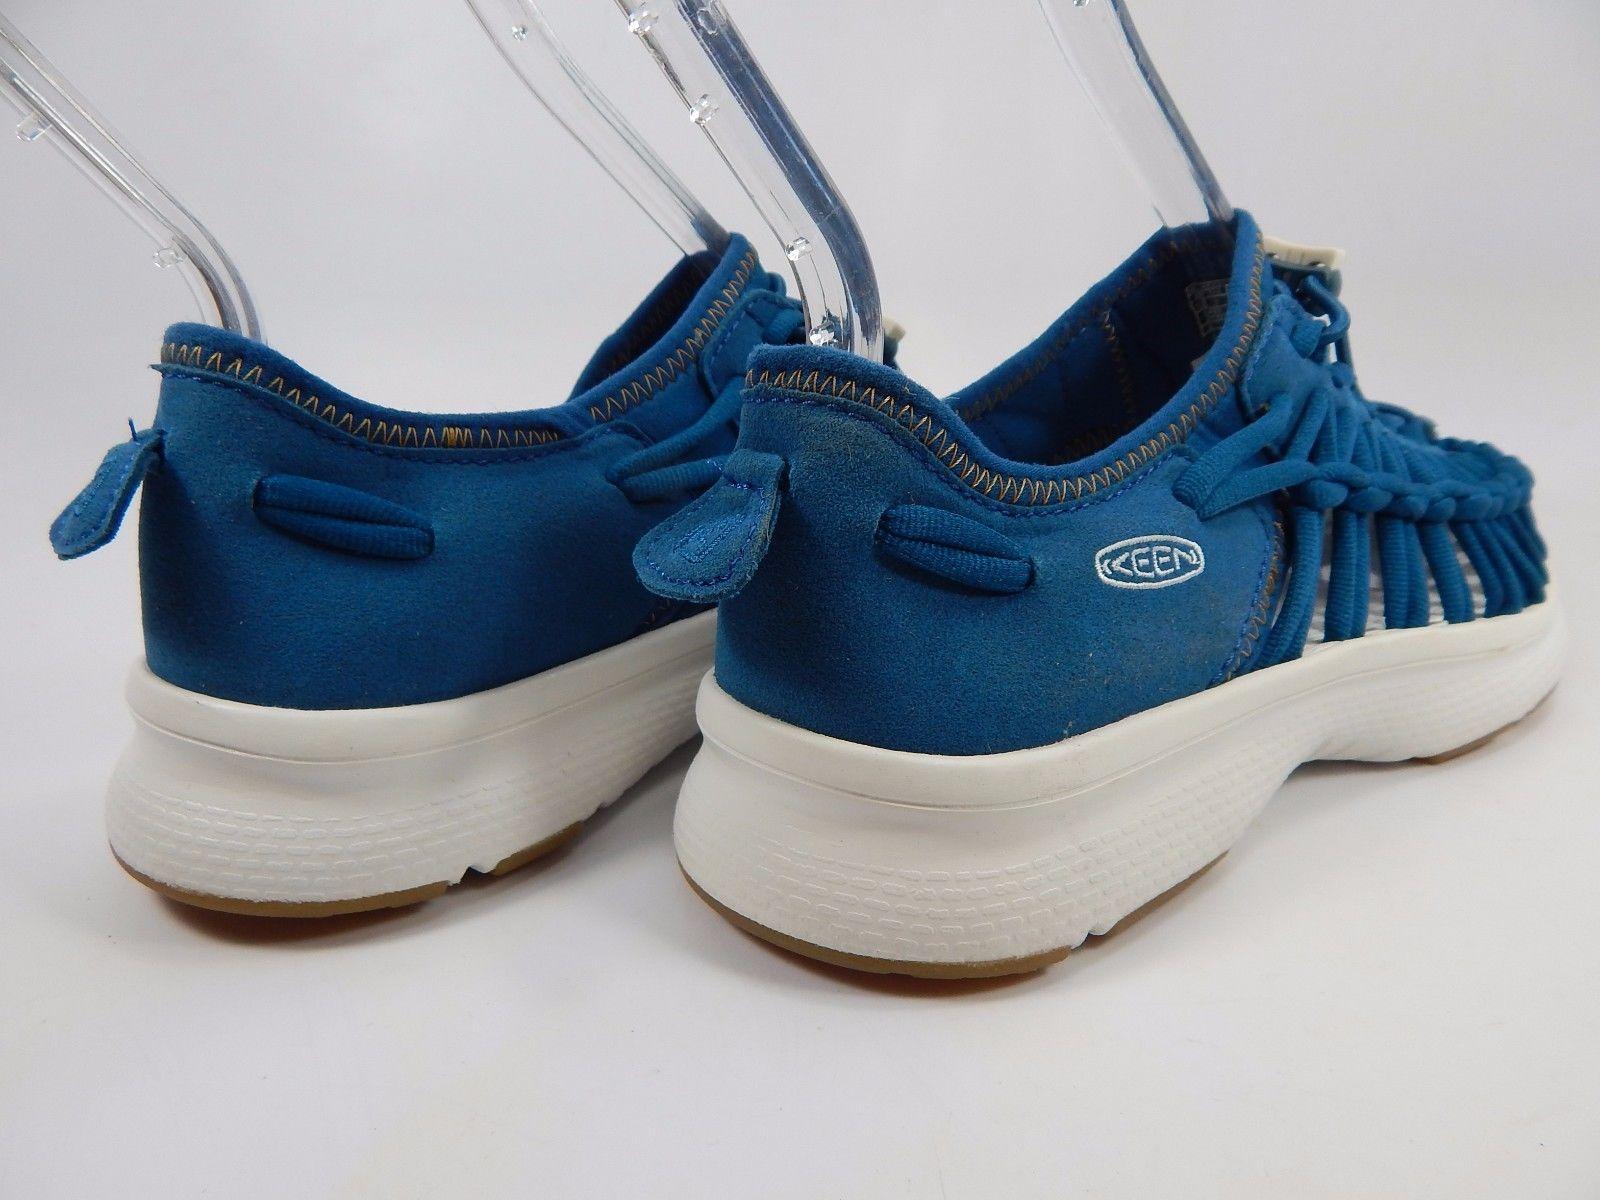 Keen Uneek o2 LTD Women's Sports Sandals Size US 7 M (B) EU 37.5 SEAPORT / WHITE